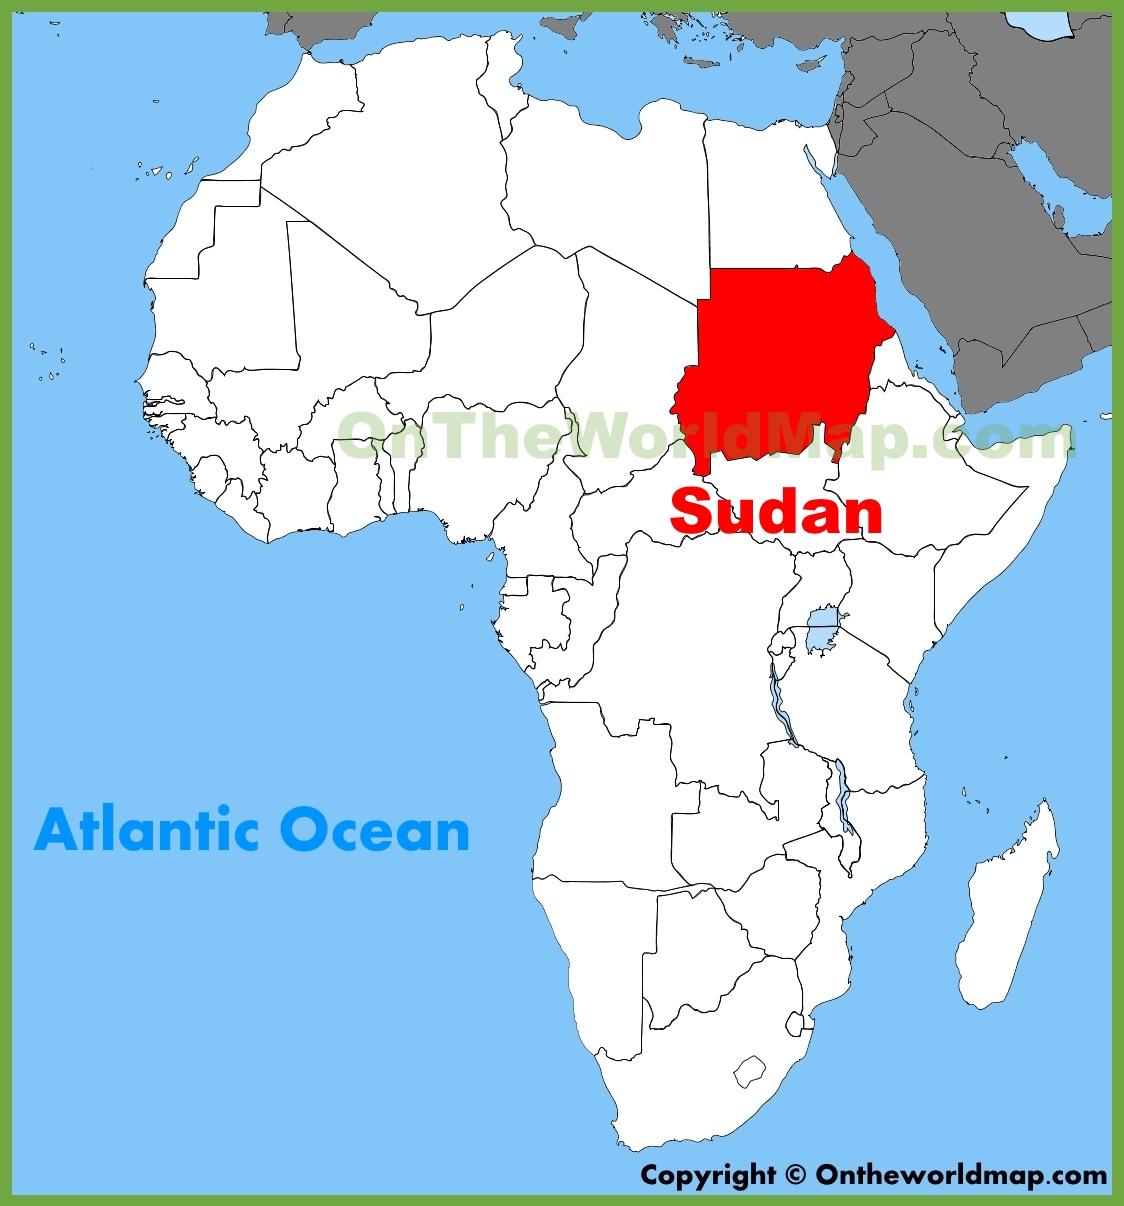 Sudan Africa Map Sudan location on the Africa map